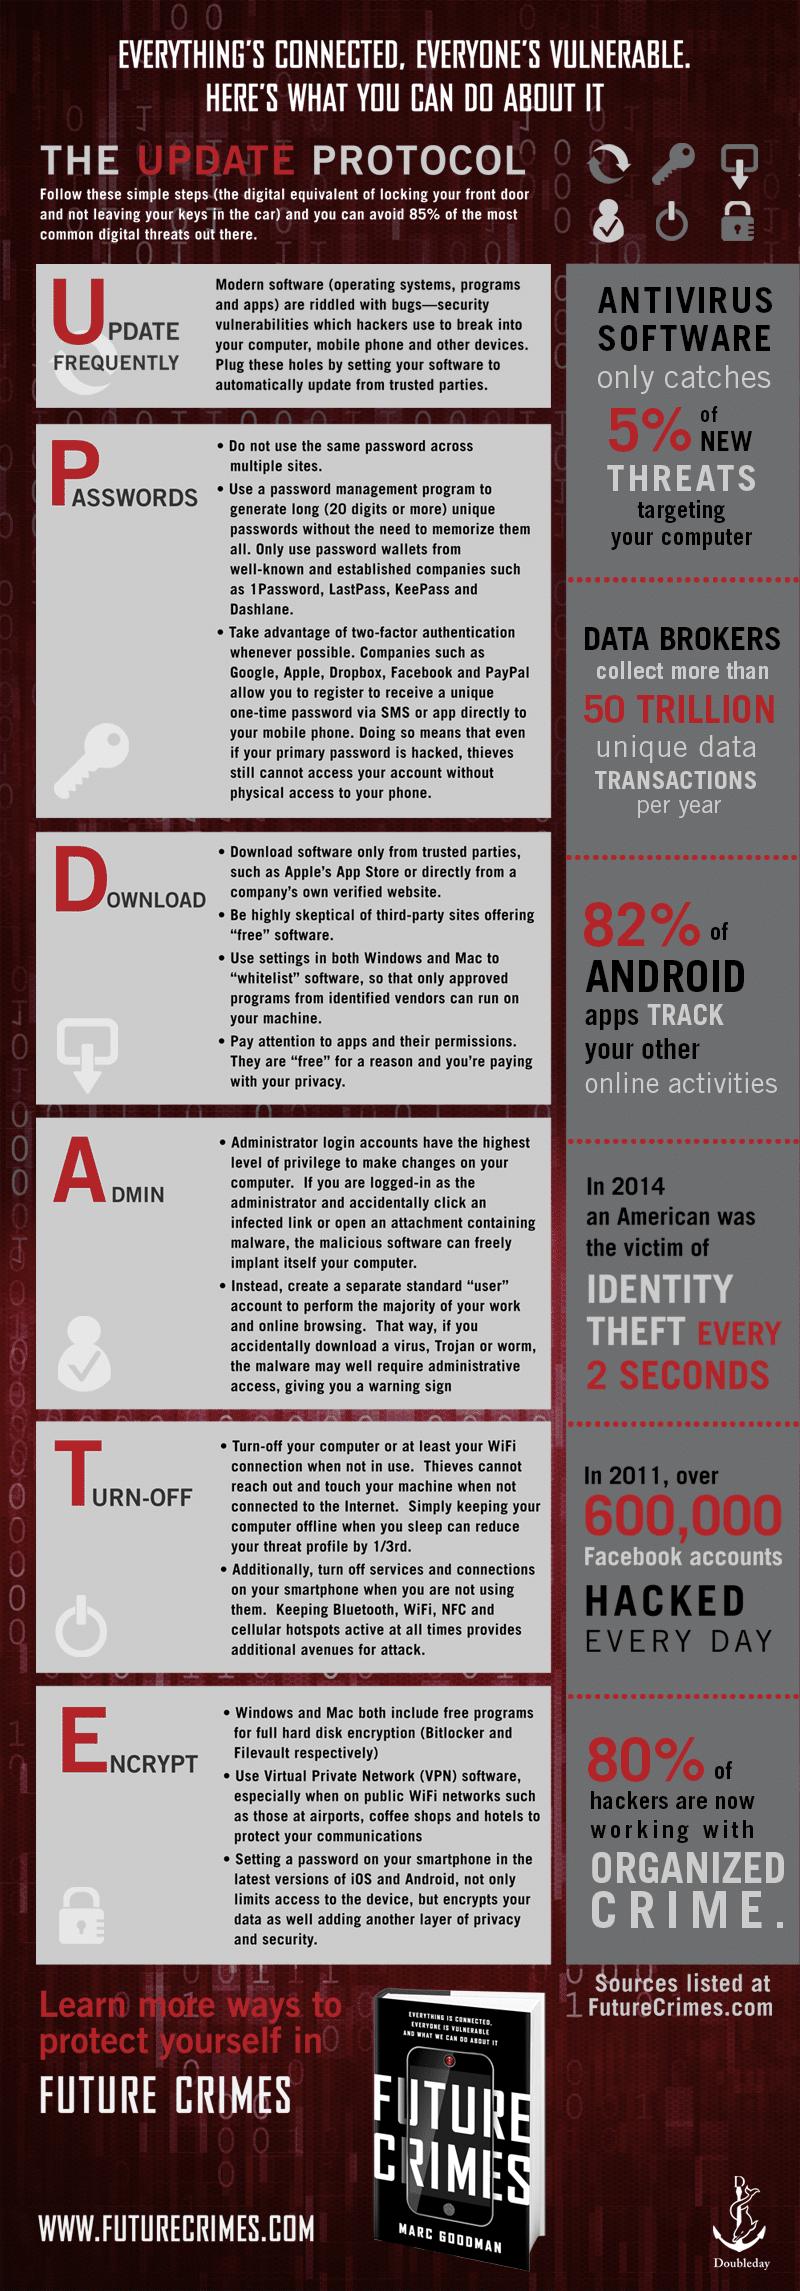 Future Crimes Infographic from futurecrimes.com